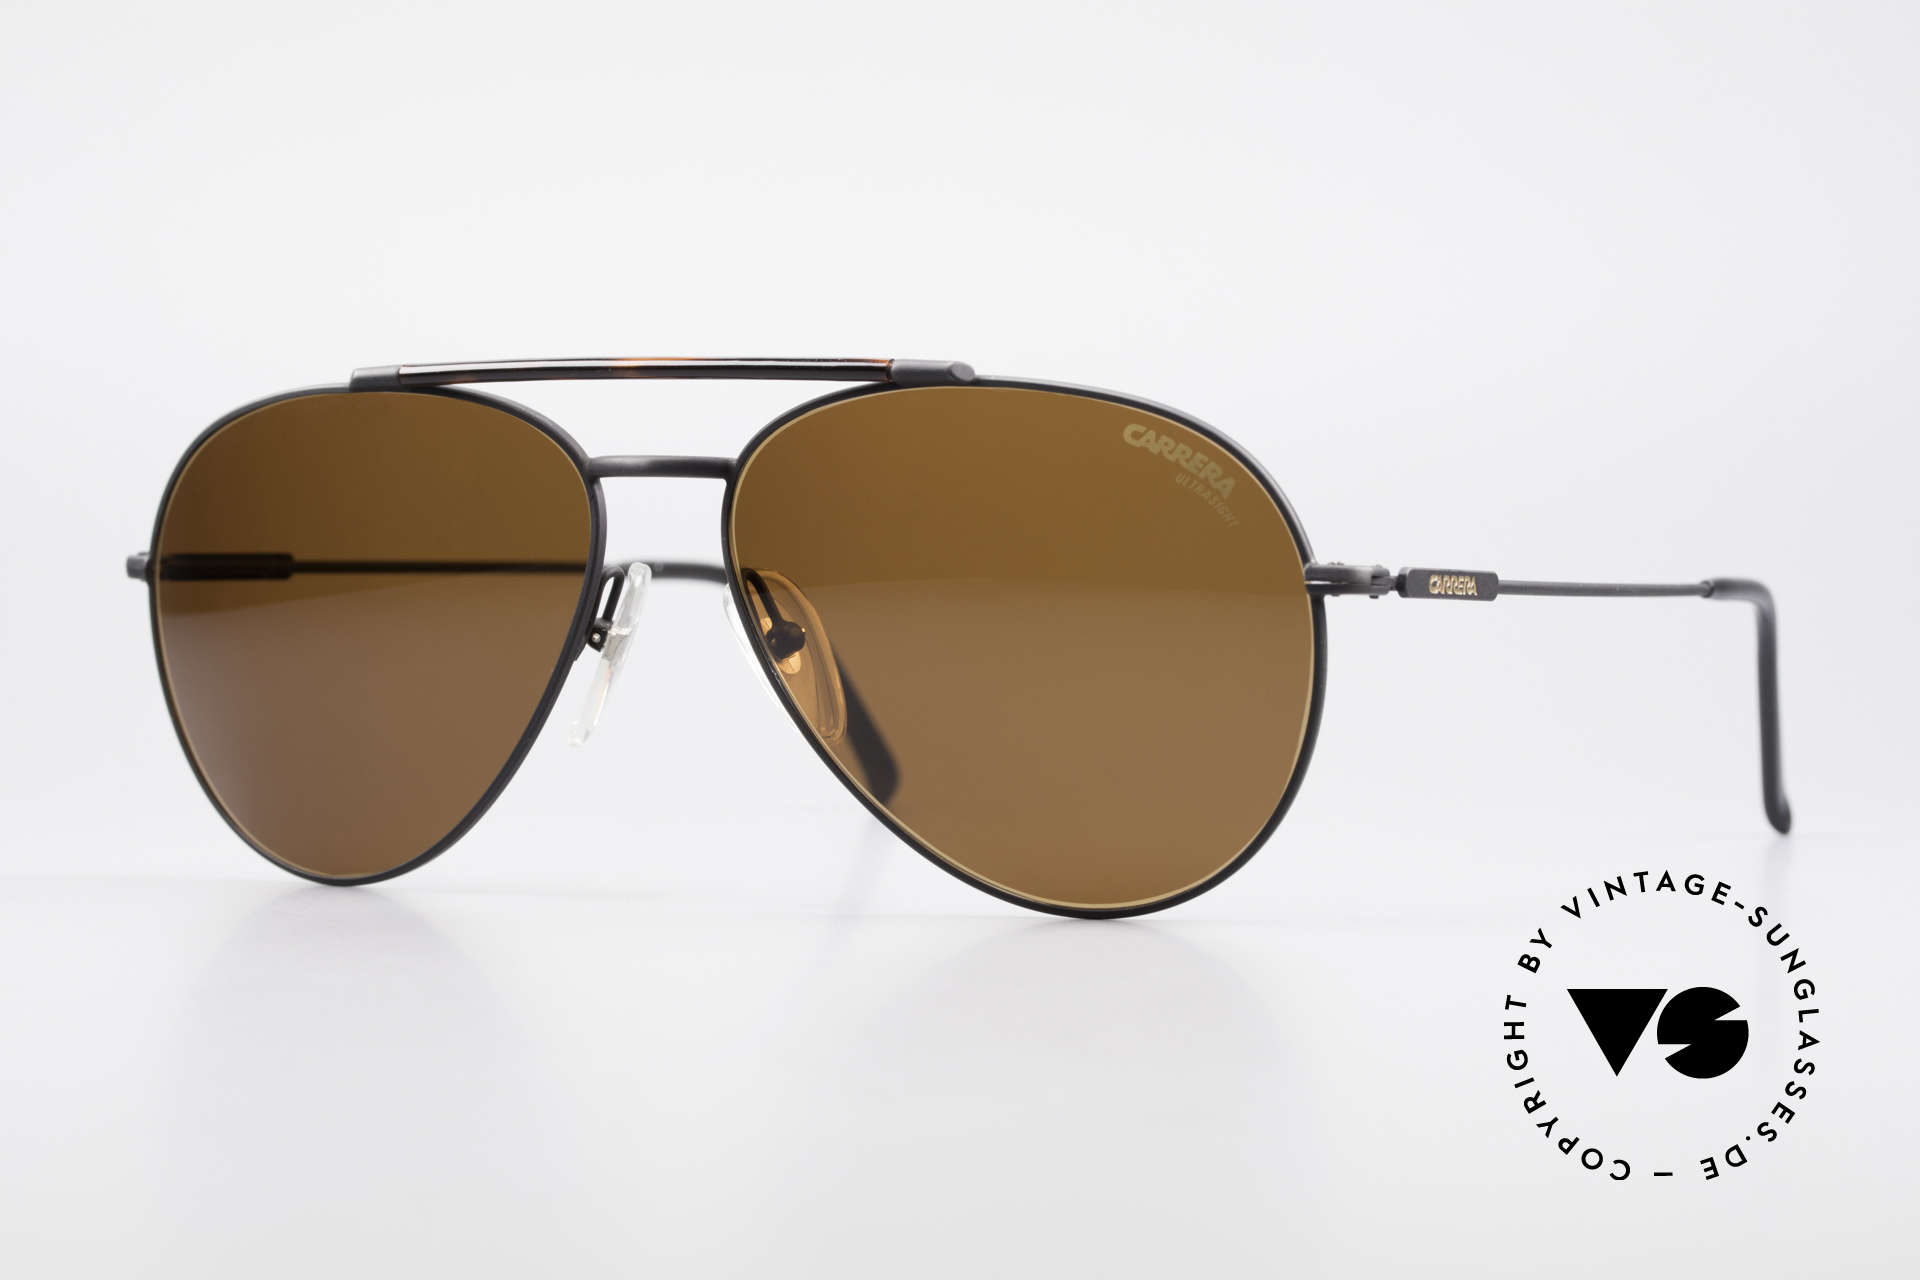 Carrera 5349 True Vintage Aviator Shades, classic vintage 80's designer sunglasses by Carrera, Made for Men